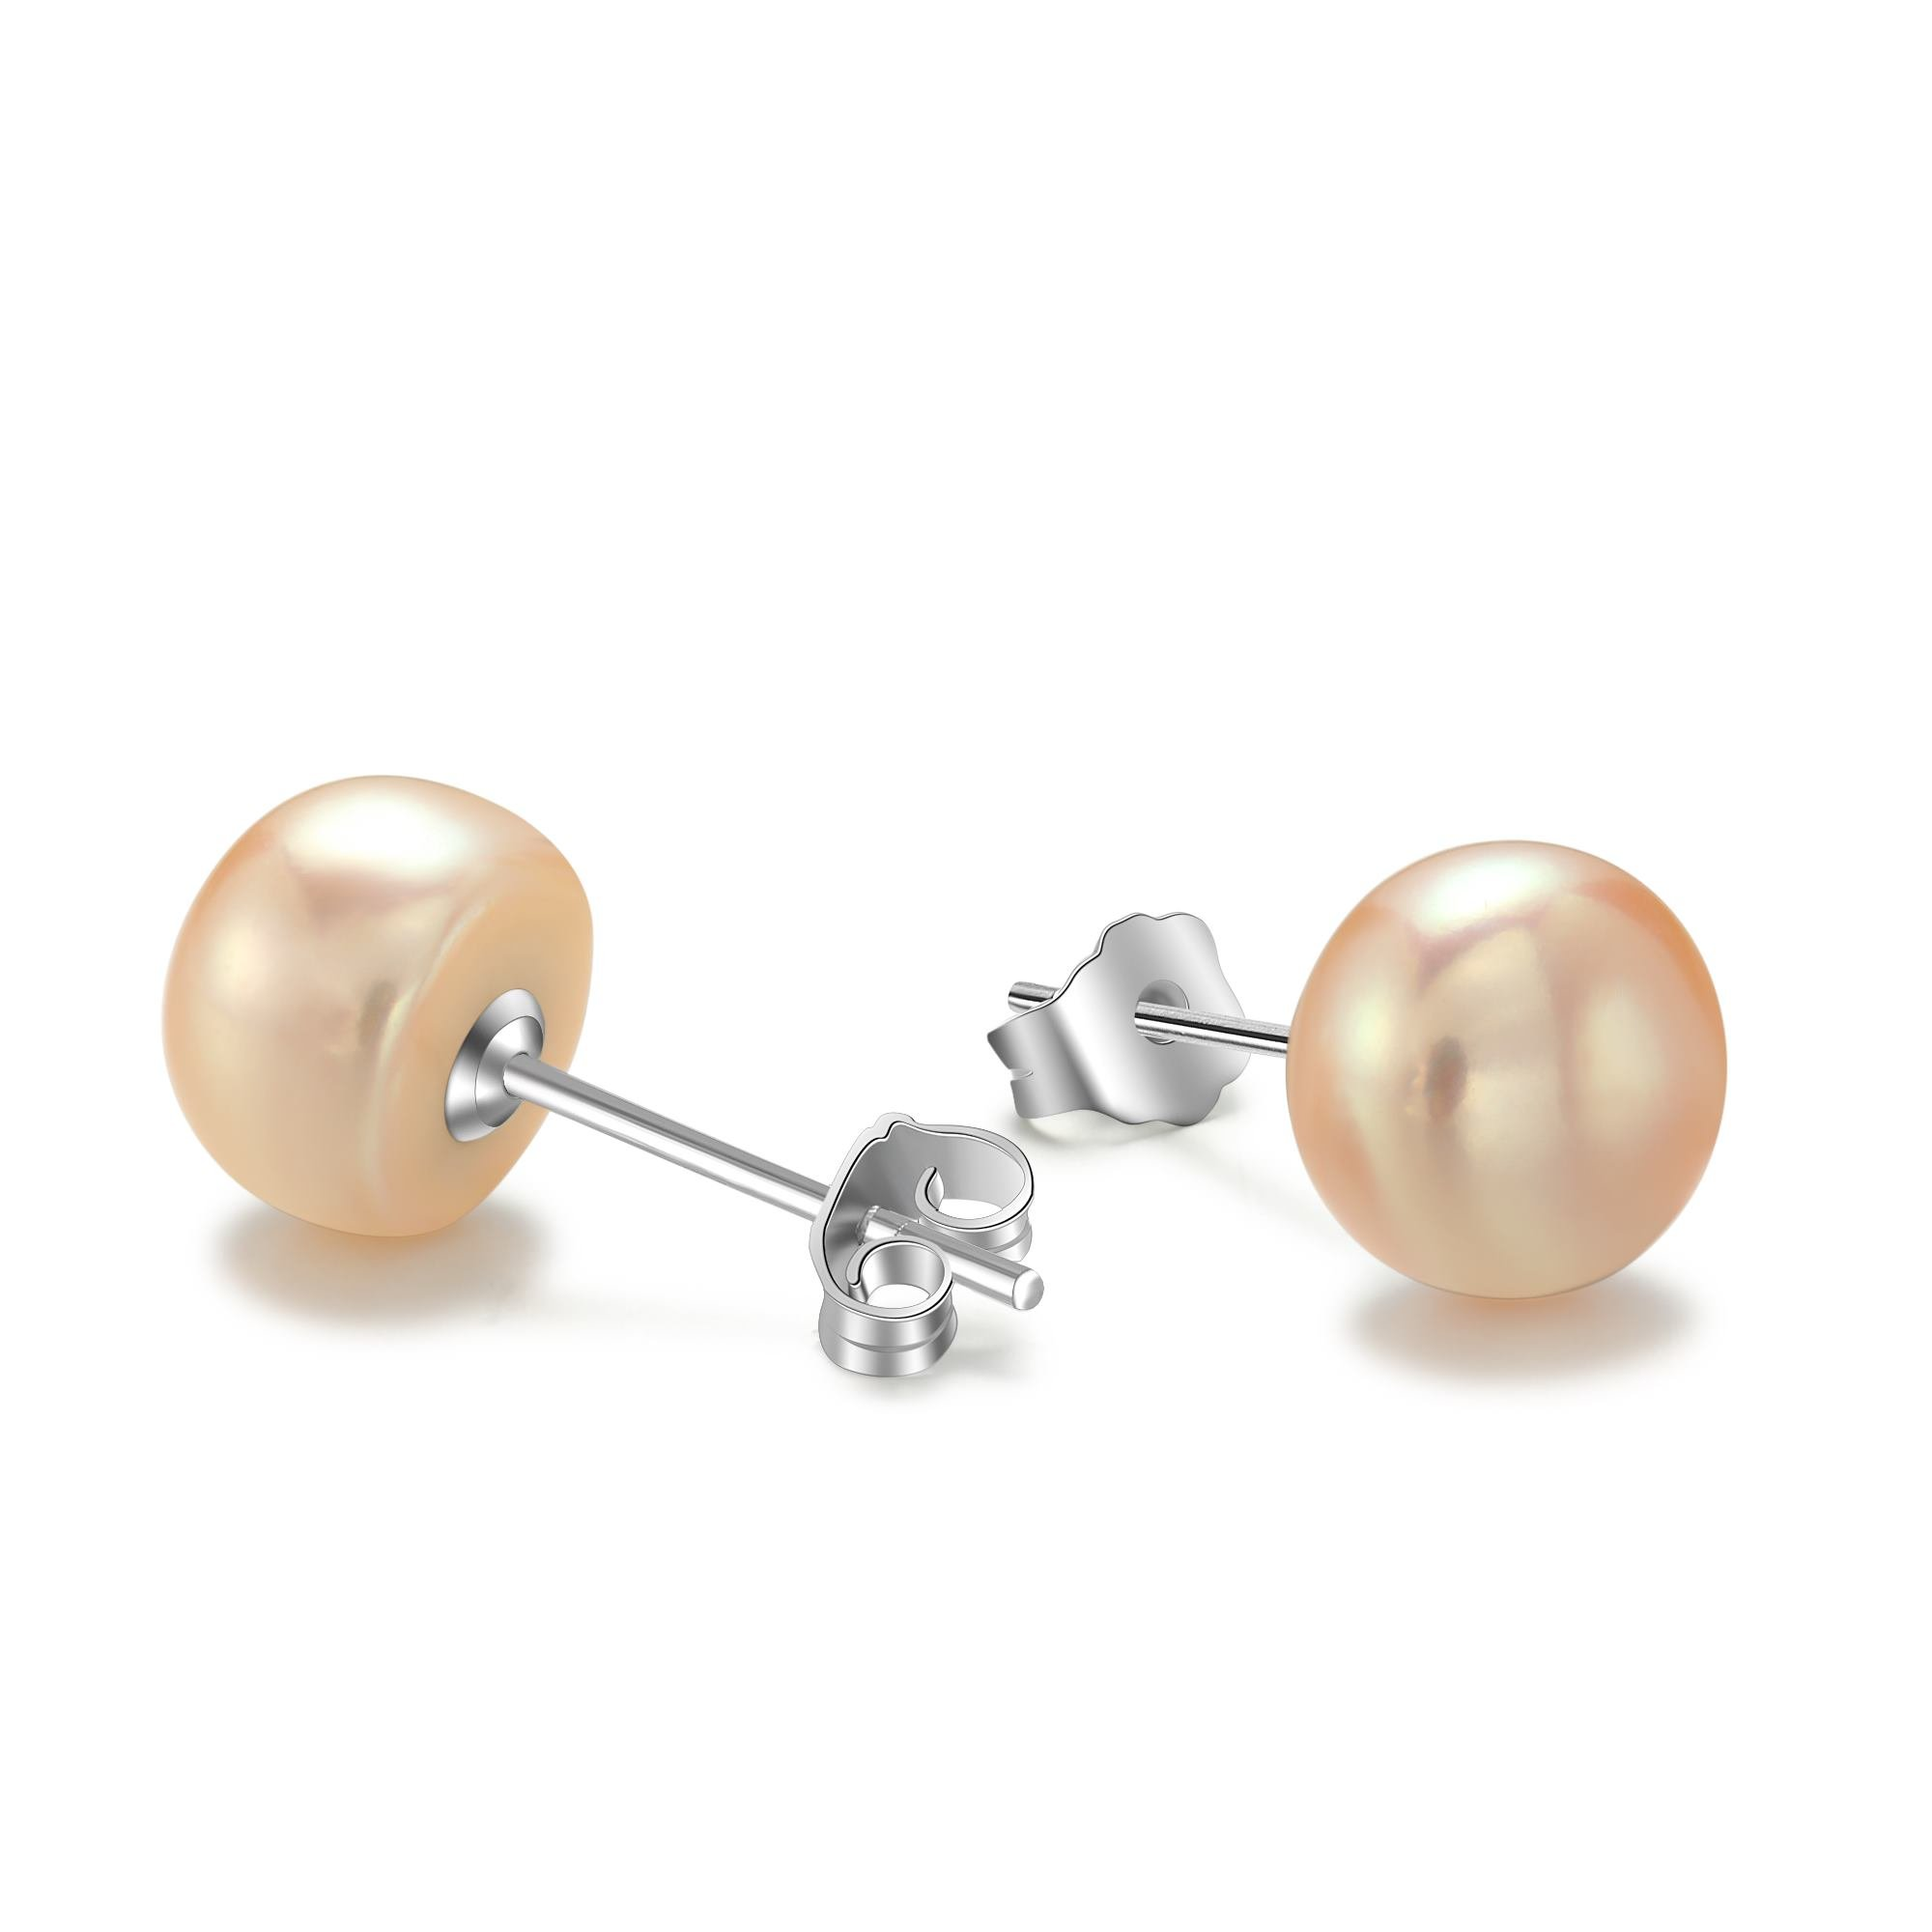 Yanxyad Handpicked AAAA+ Round Stud Freshwater Cultured Pearl Earrings